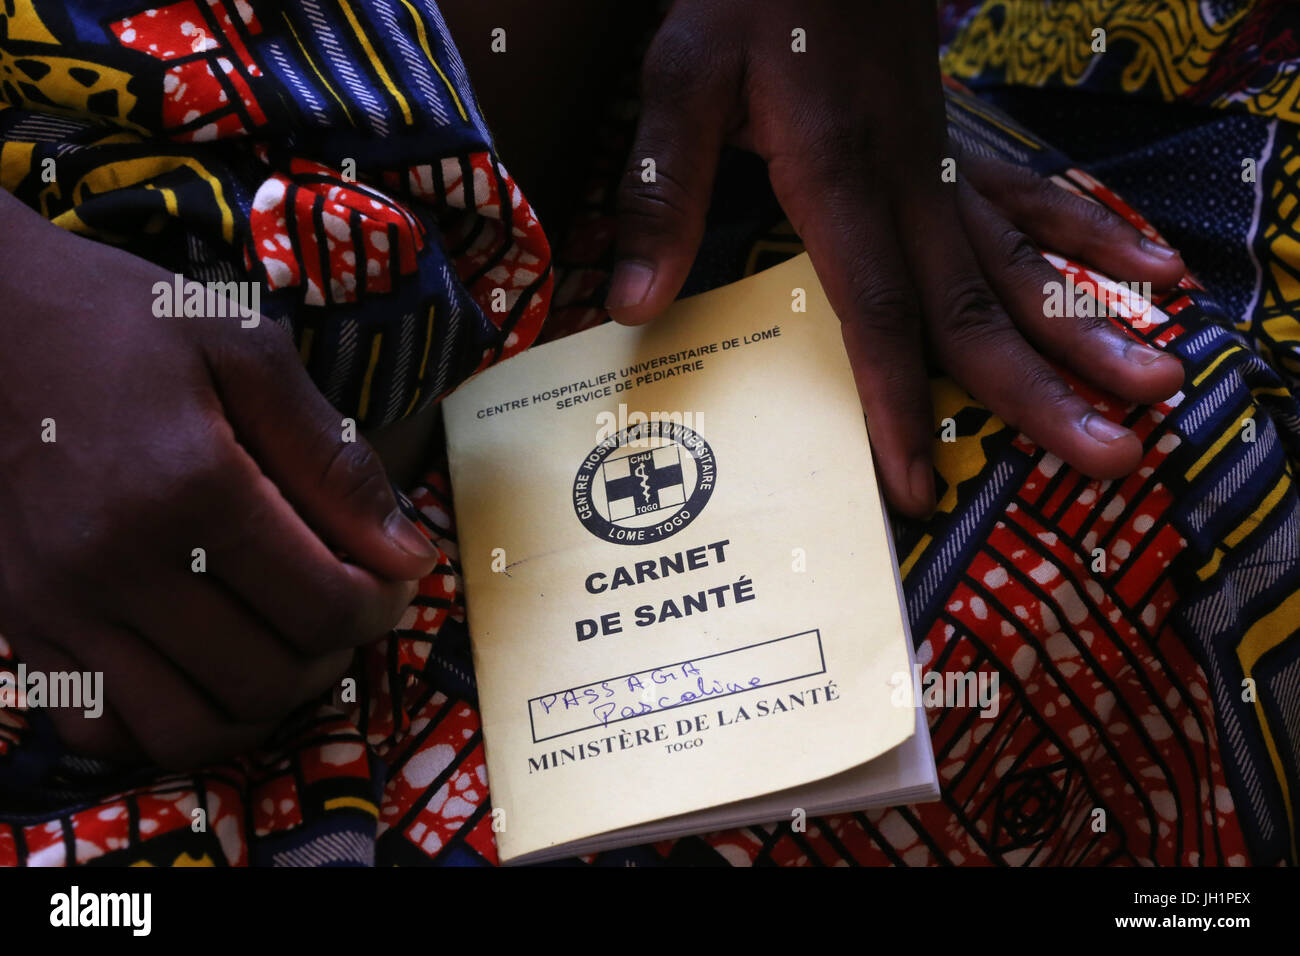 Hospital pediátrico de África. Salud. Folleto de registro de salud infantil. Togo. Foto de stock